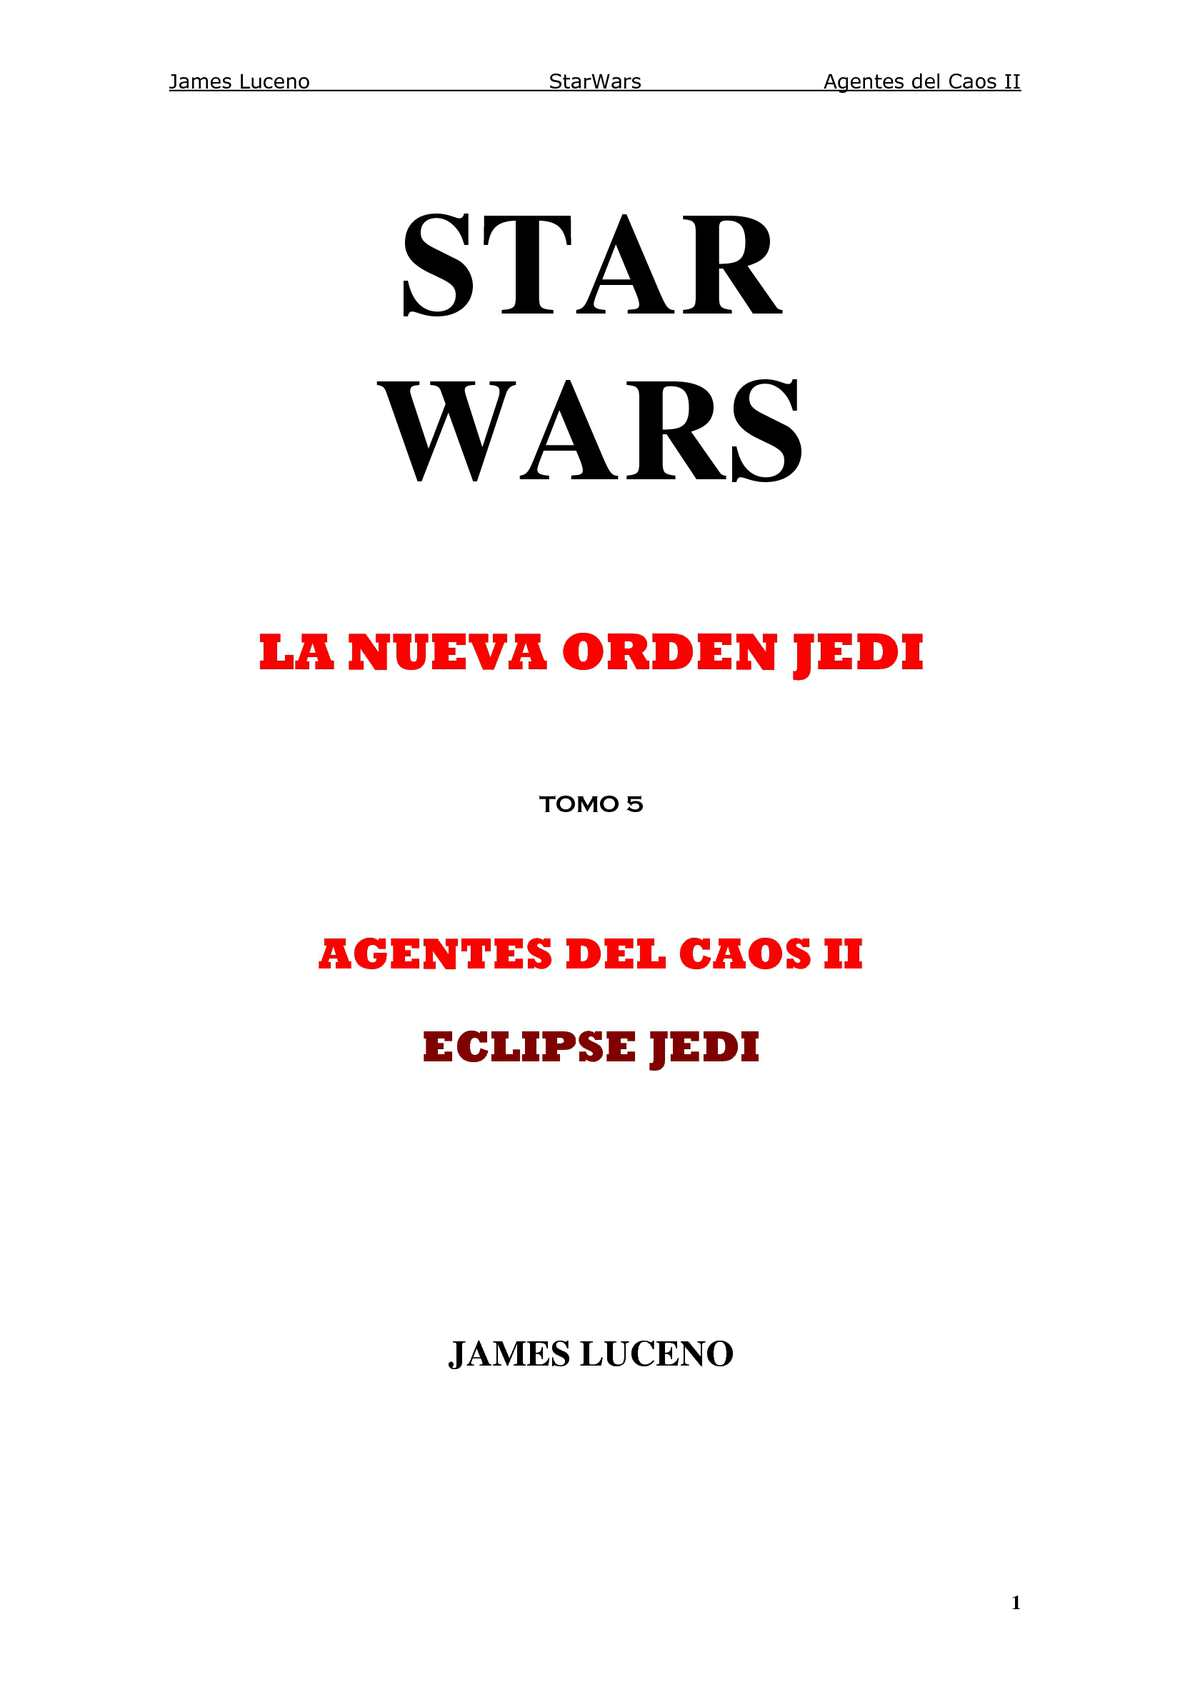 Calaméo -  25 a 29 DBY LNOJ 05 Agentes del Caos II - Eclipse Jedi 0f91f8774d9a